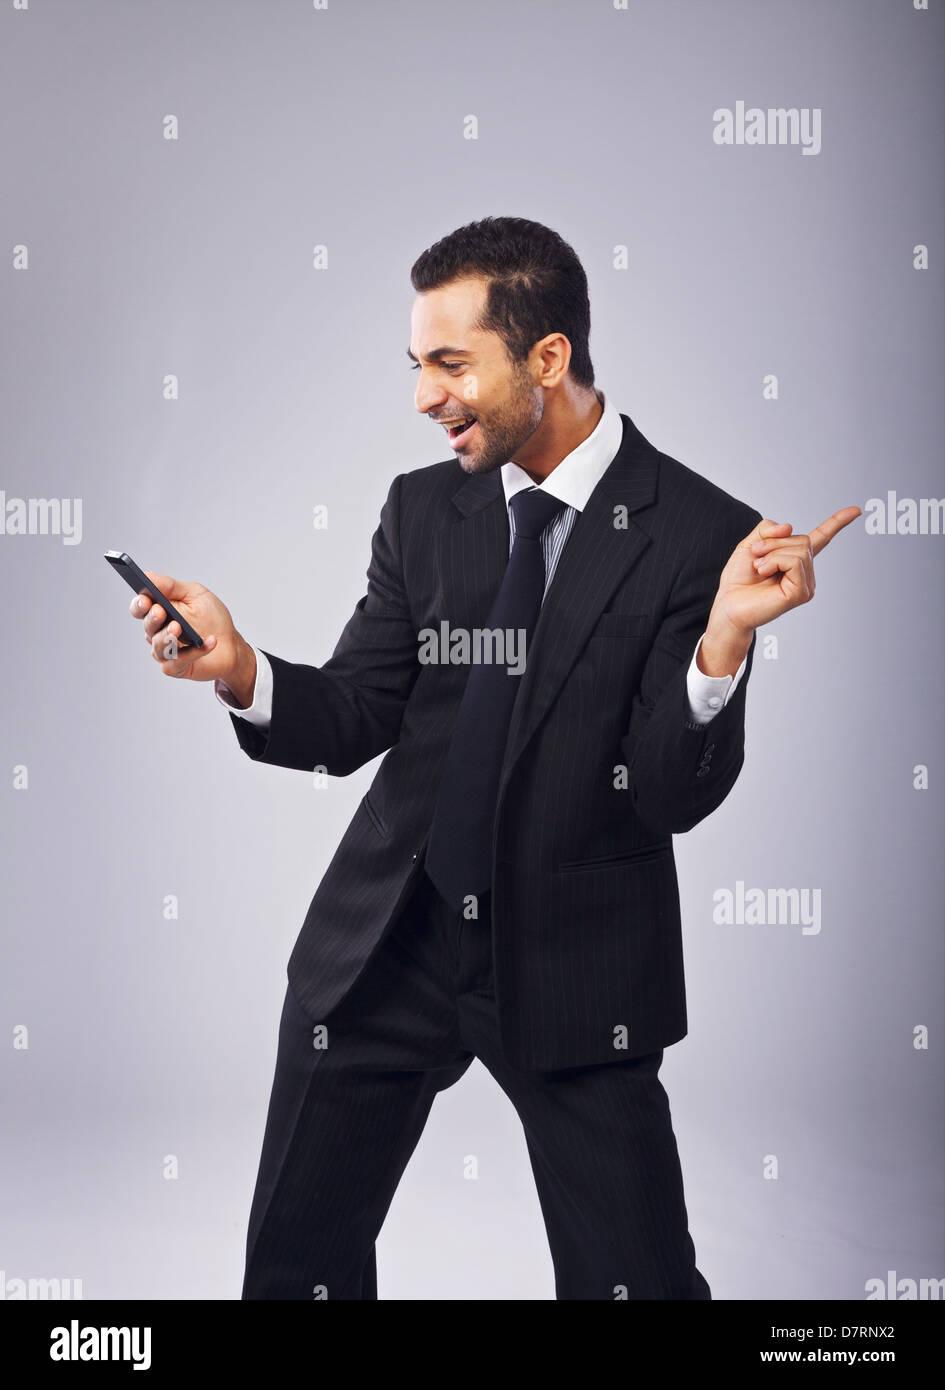 Junger Geschäftsmann mit Telefon aus Freude tanzen Stockbild